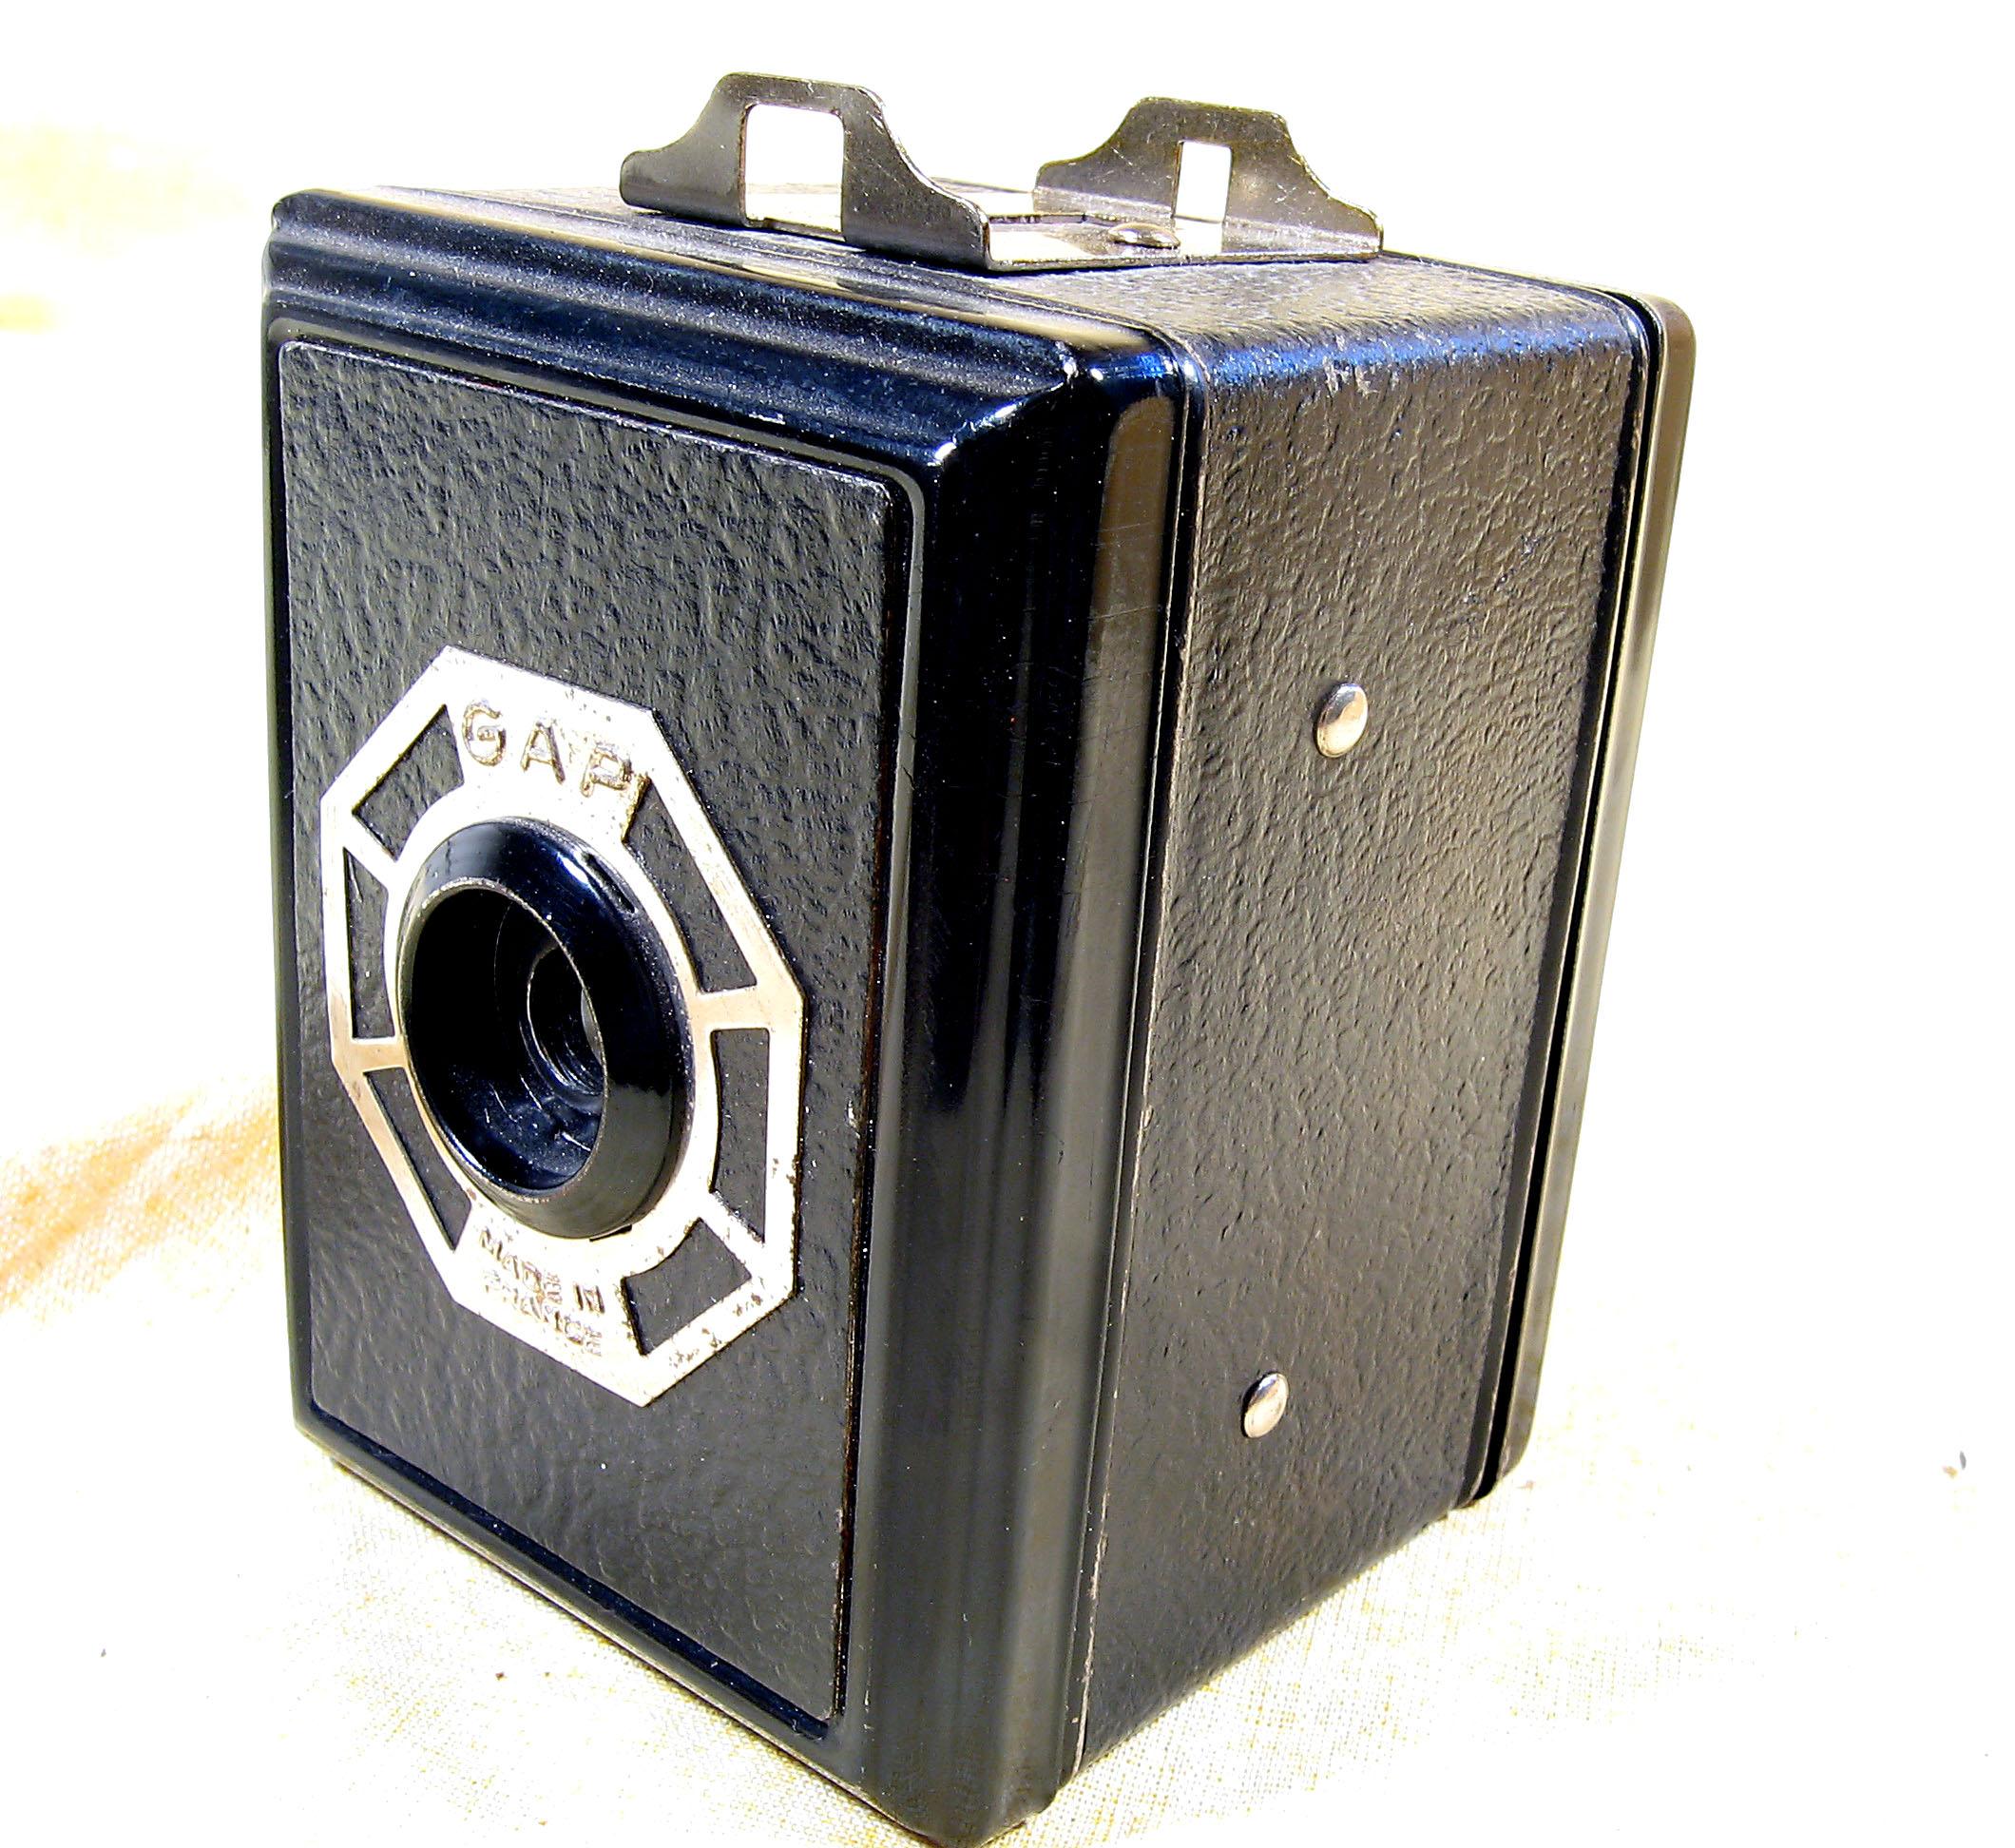 Wallpaper 2465-2  GAP  box  3X4 enjoliveur polygonal sur fond noir, collection AMI Appareils photos